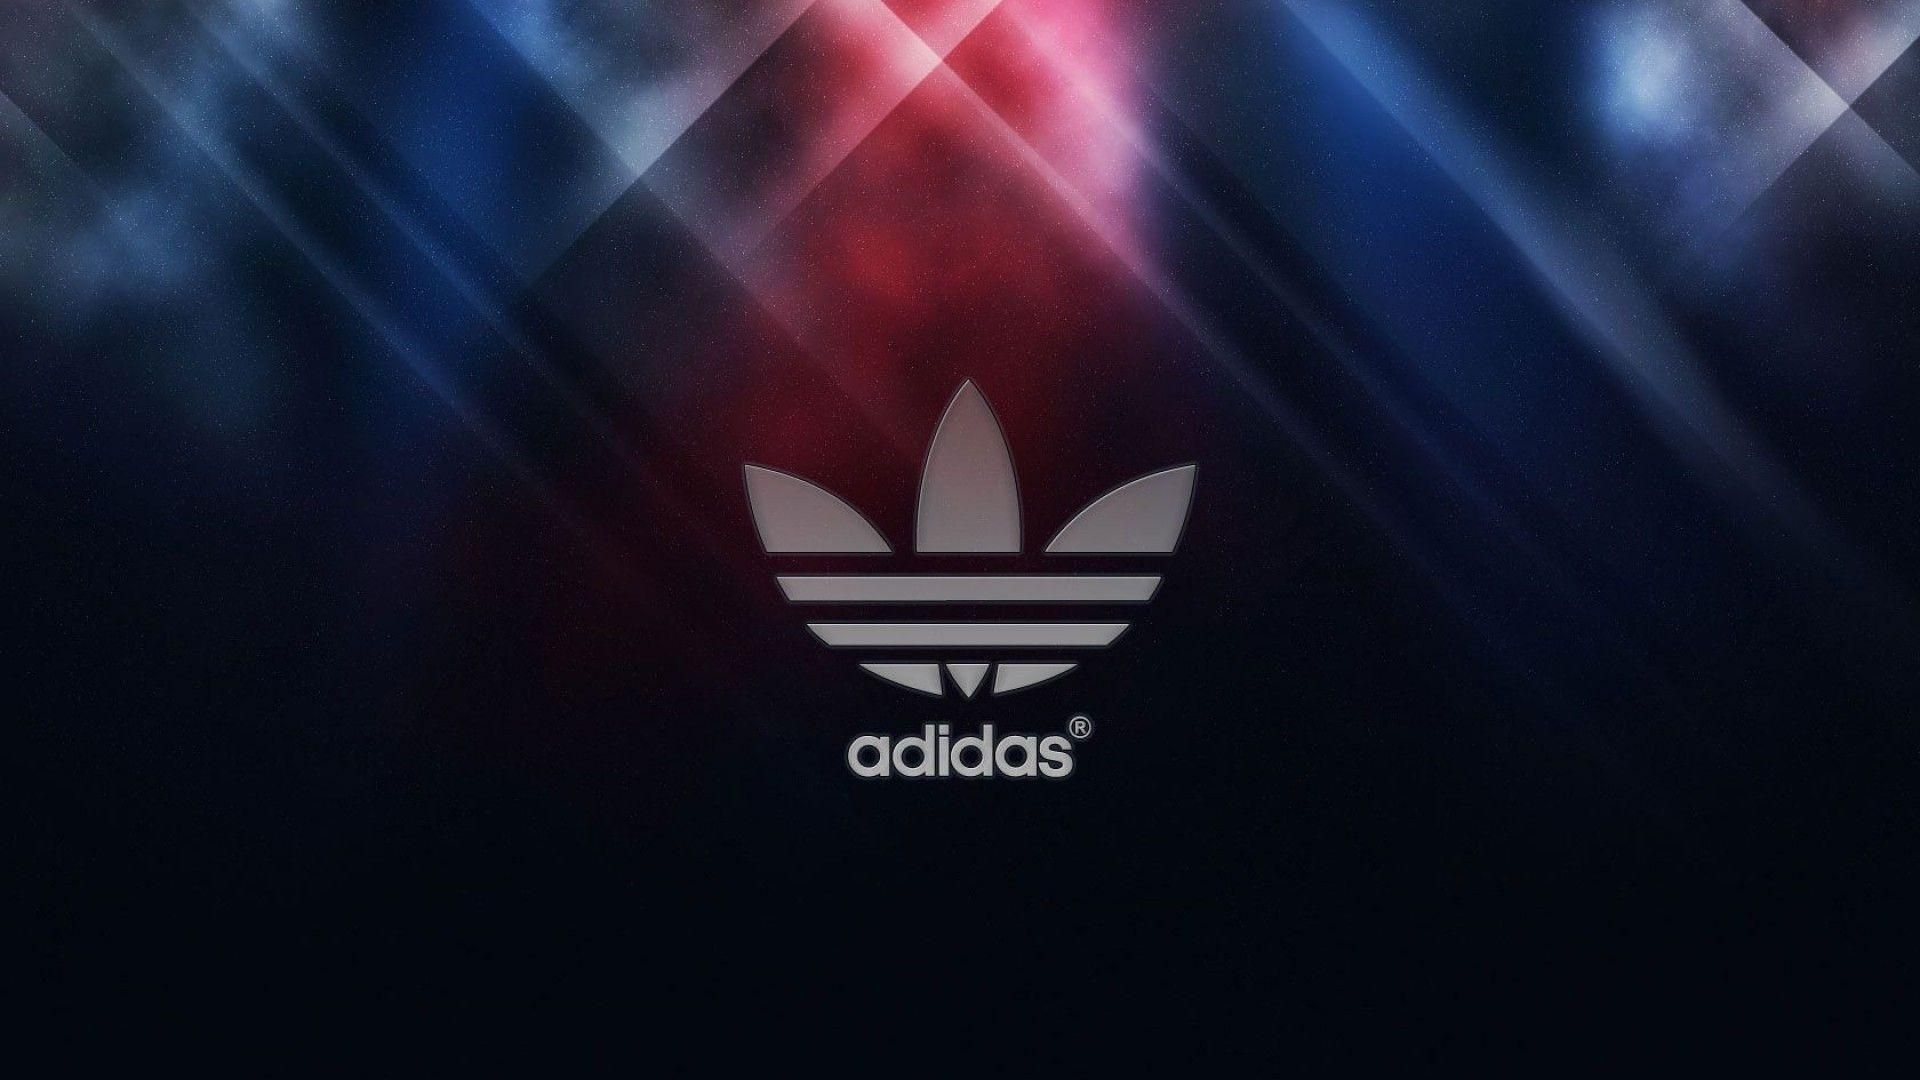 Wallpapers Smartphone Adidas